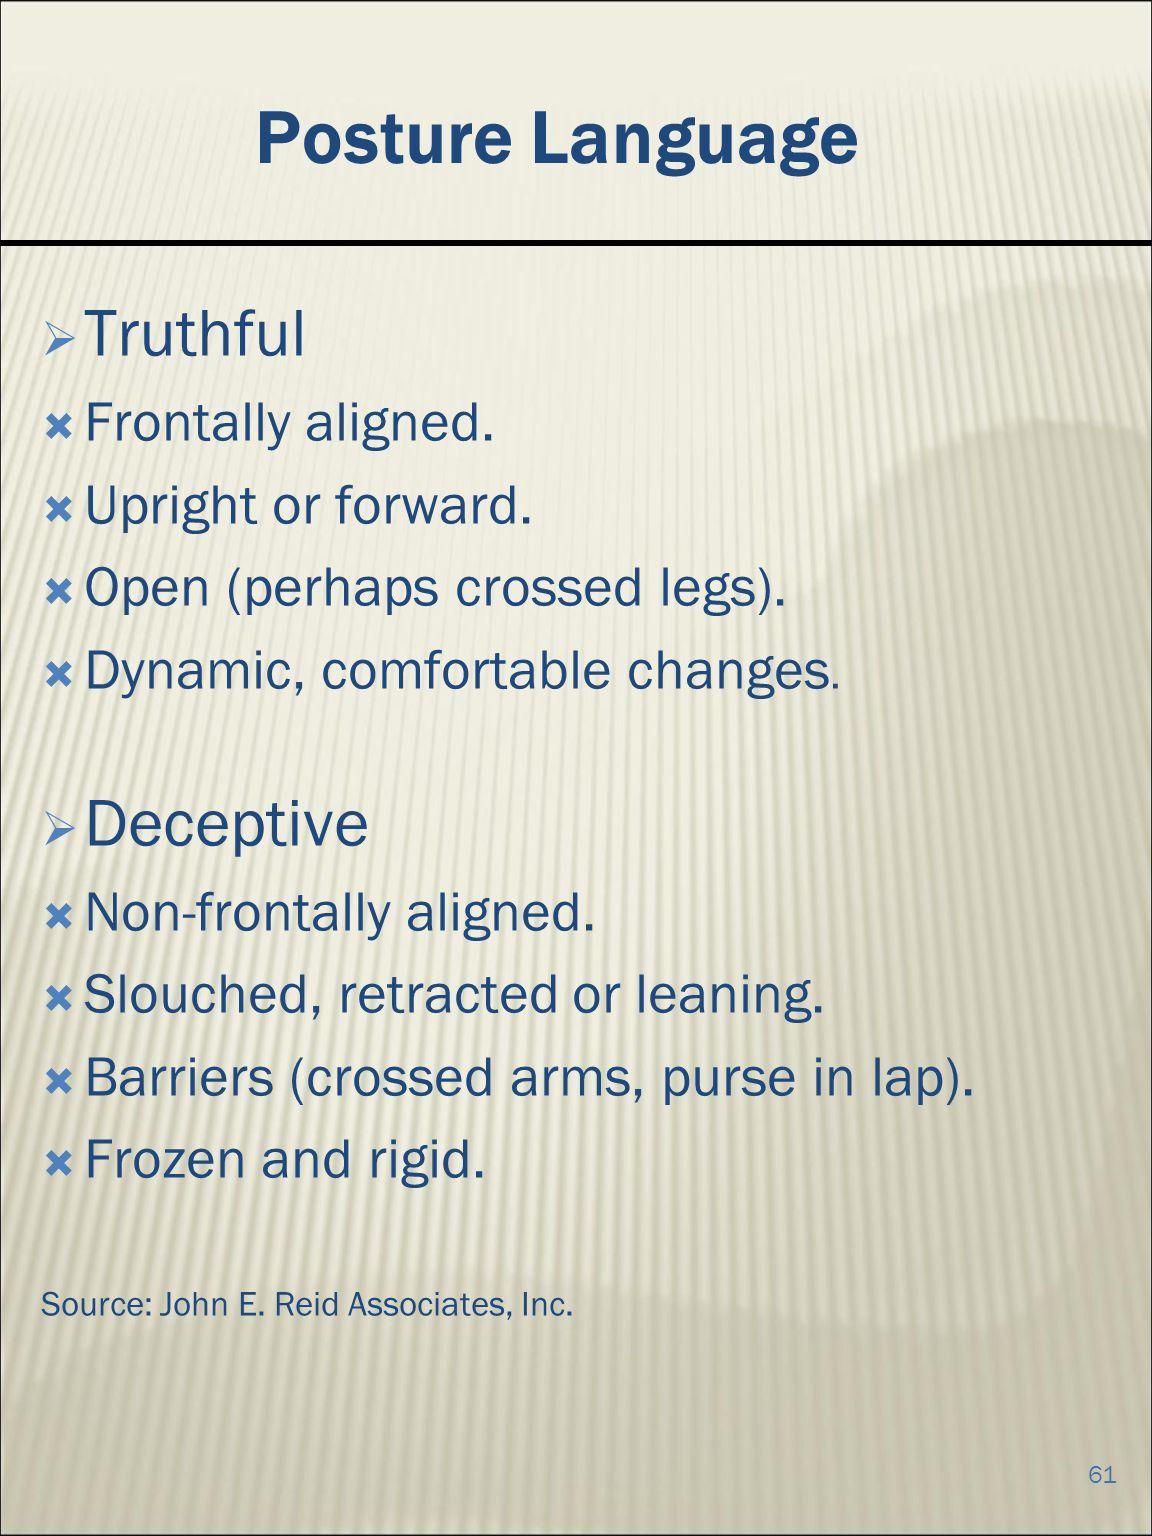 Posture Language Truthful Deceptive Frontally aligned.